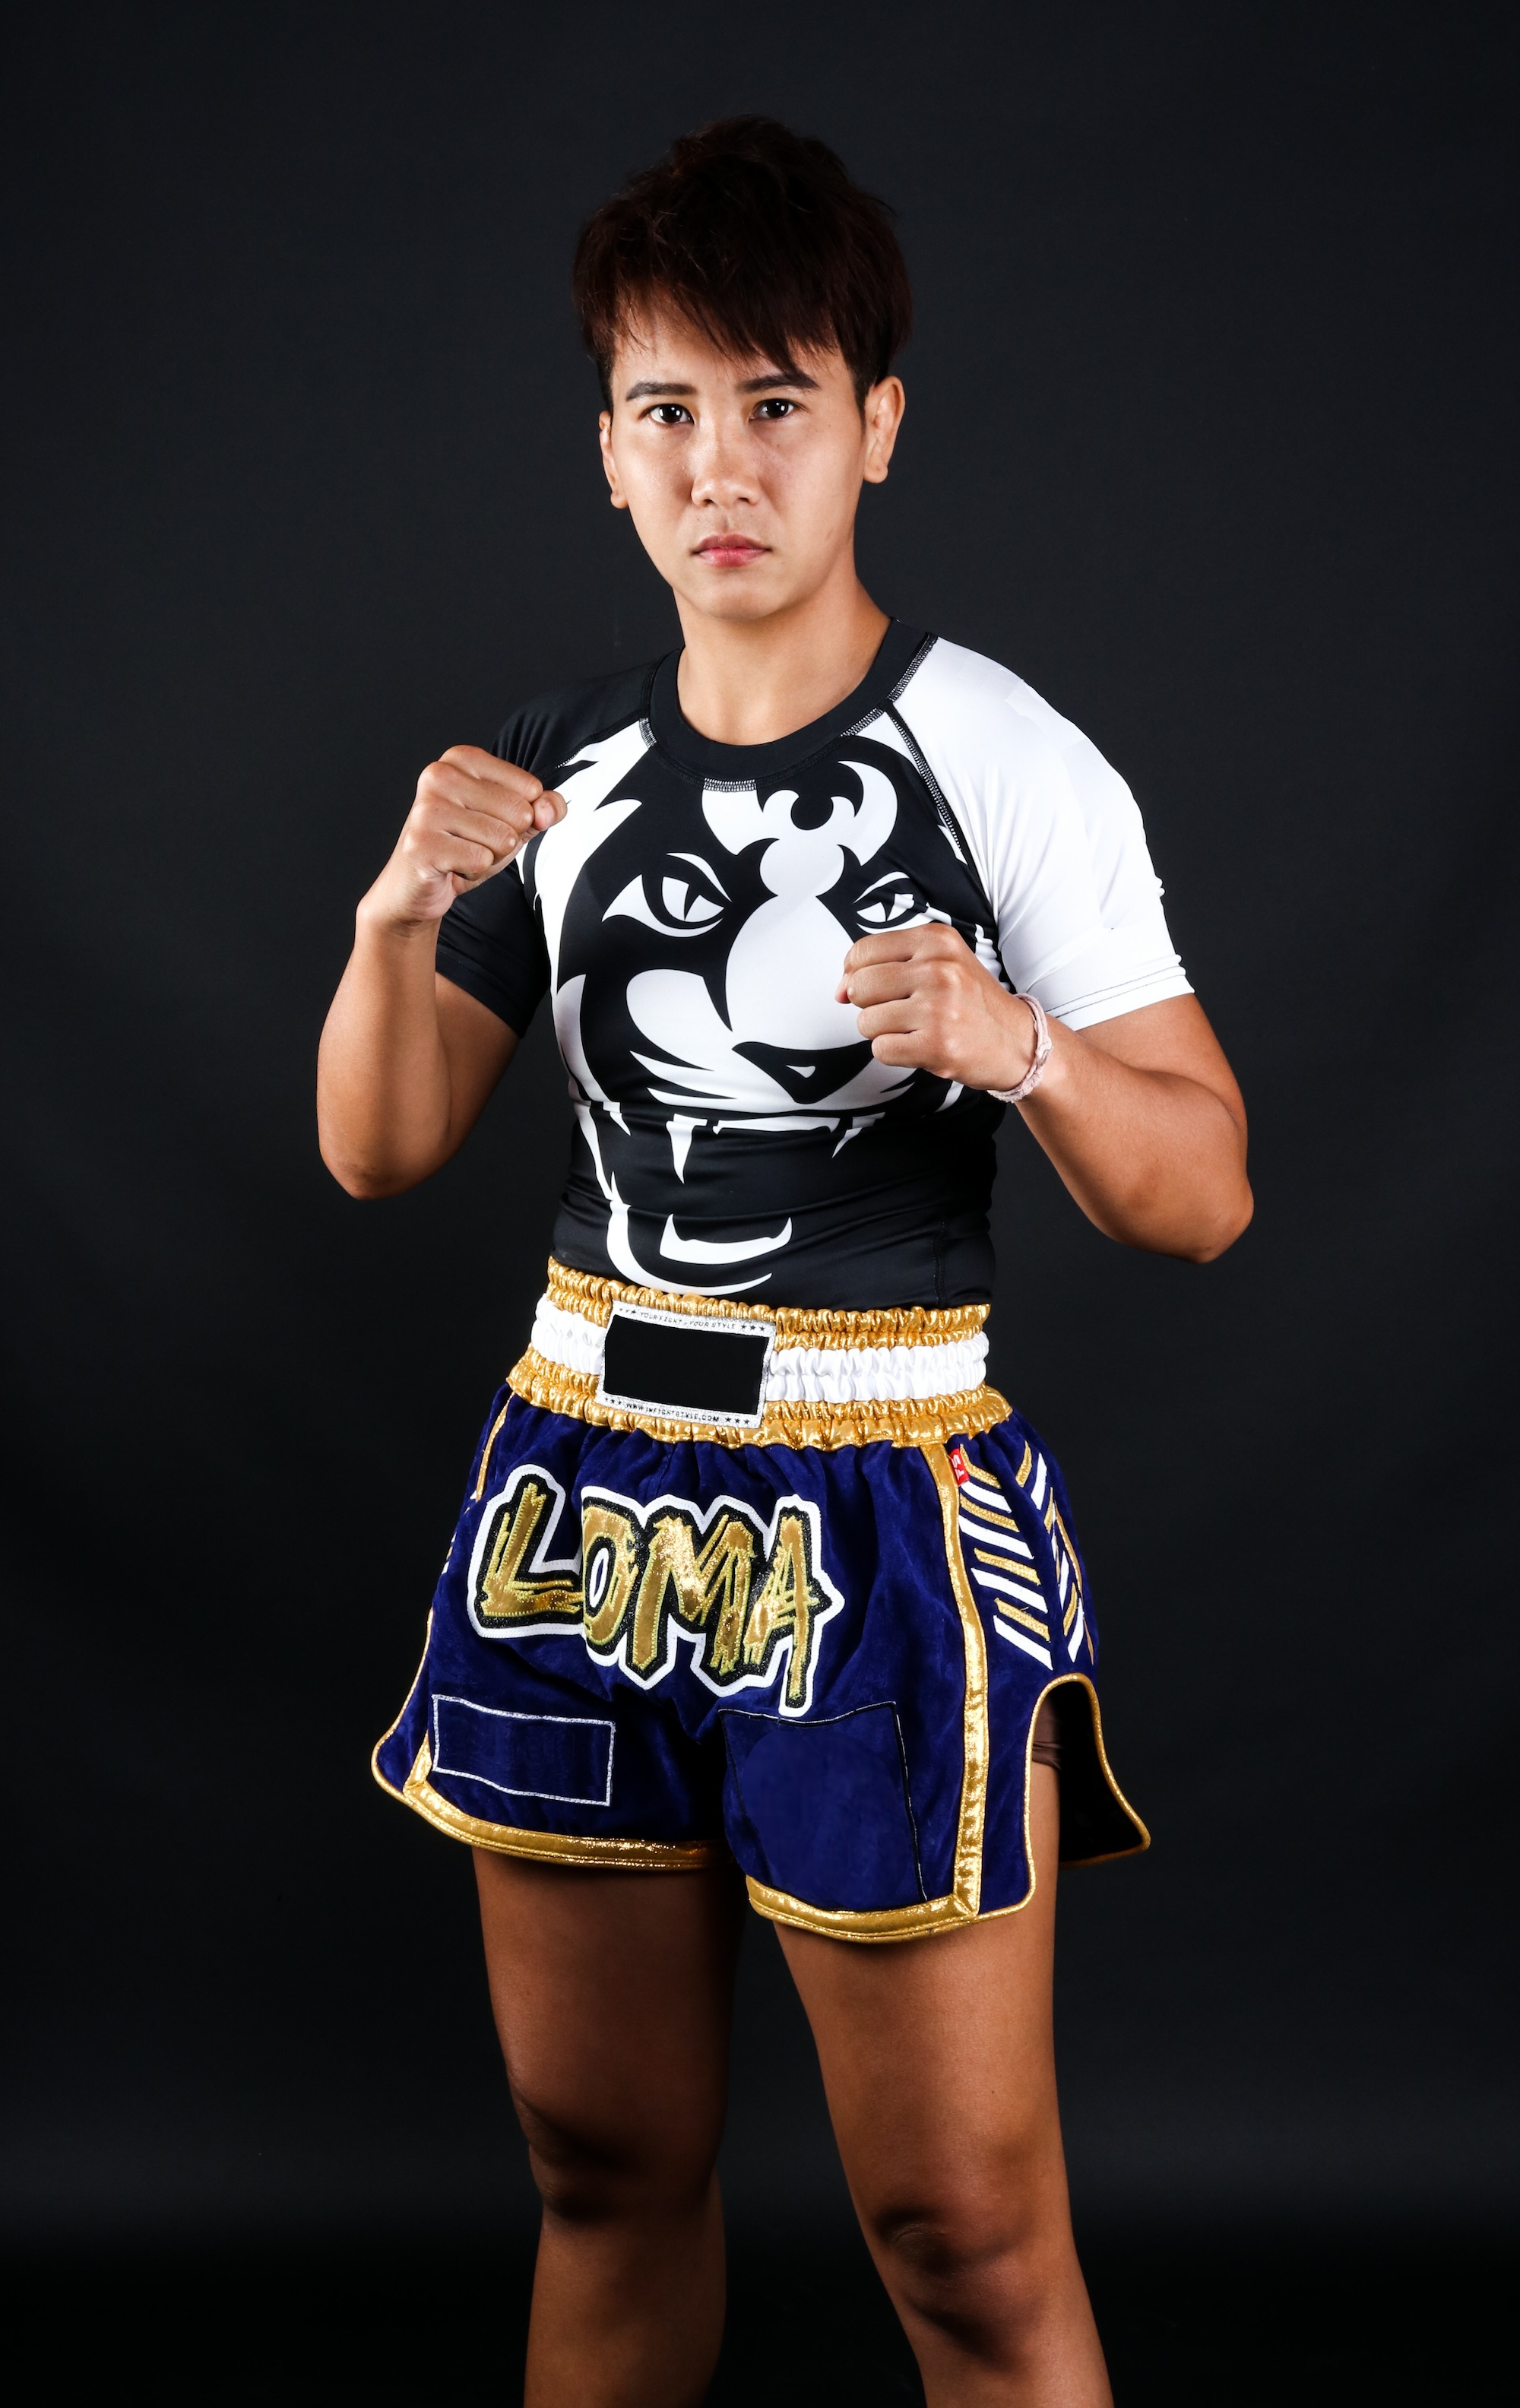 "UFC Singapore adds first Thai athlete ""Loma Lookboonmee"" vs Alexandra Albu and China's Yan Xiaonan vs Ashley Yoder - ufc"